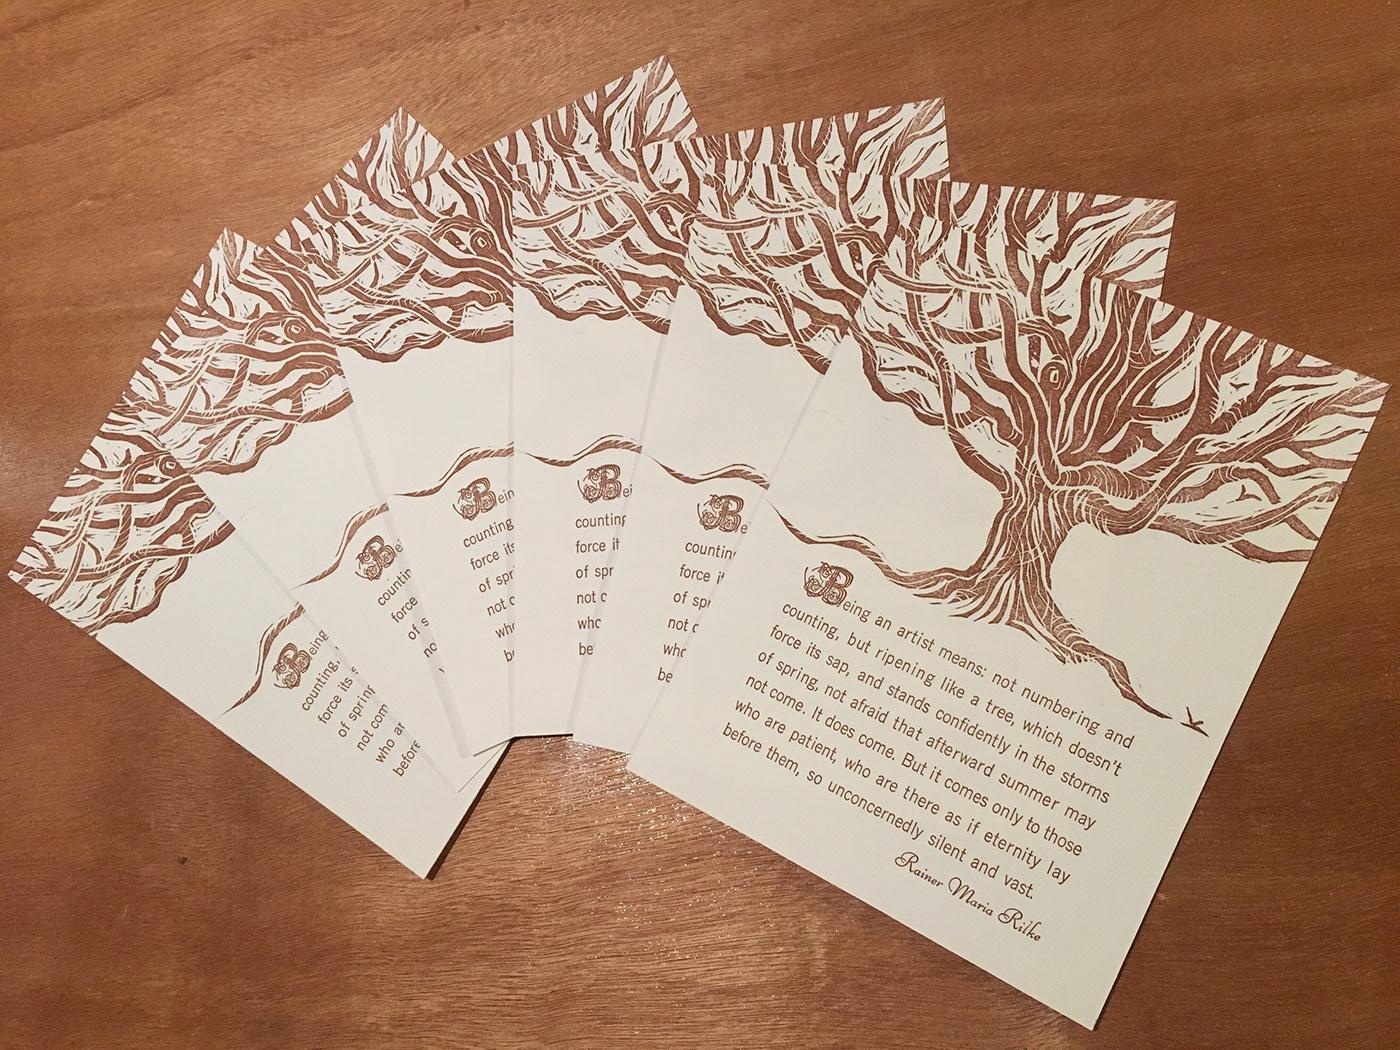 Book Arts broadside carving letterpress linocut Patience poetics printmaking Tree  typesetting